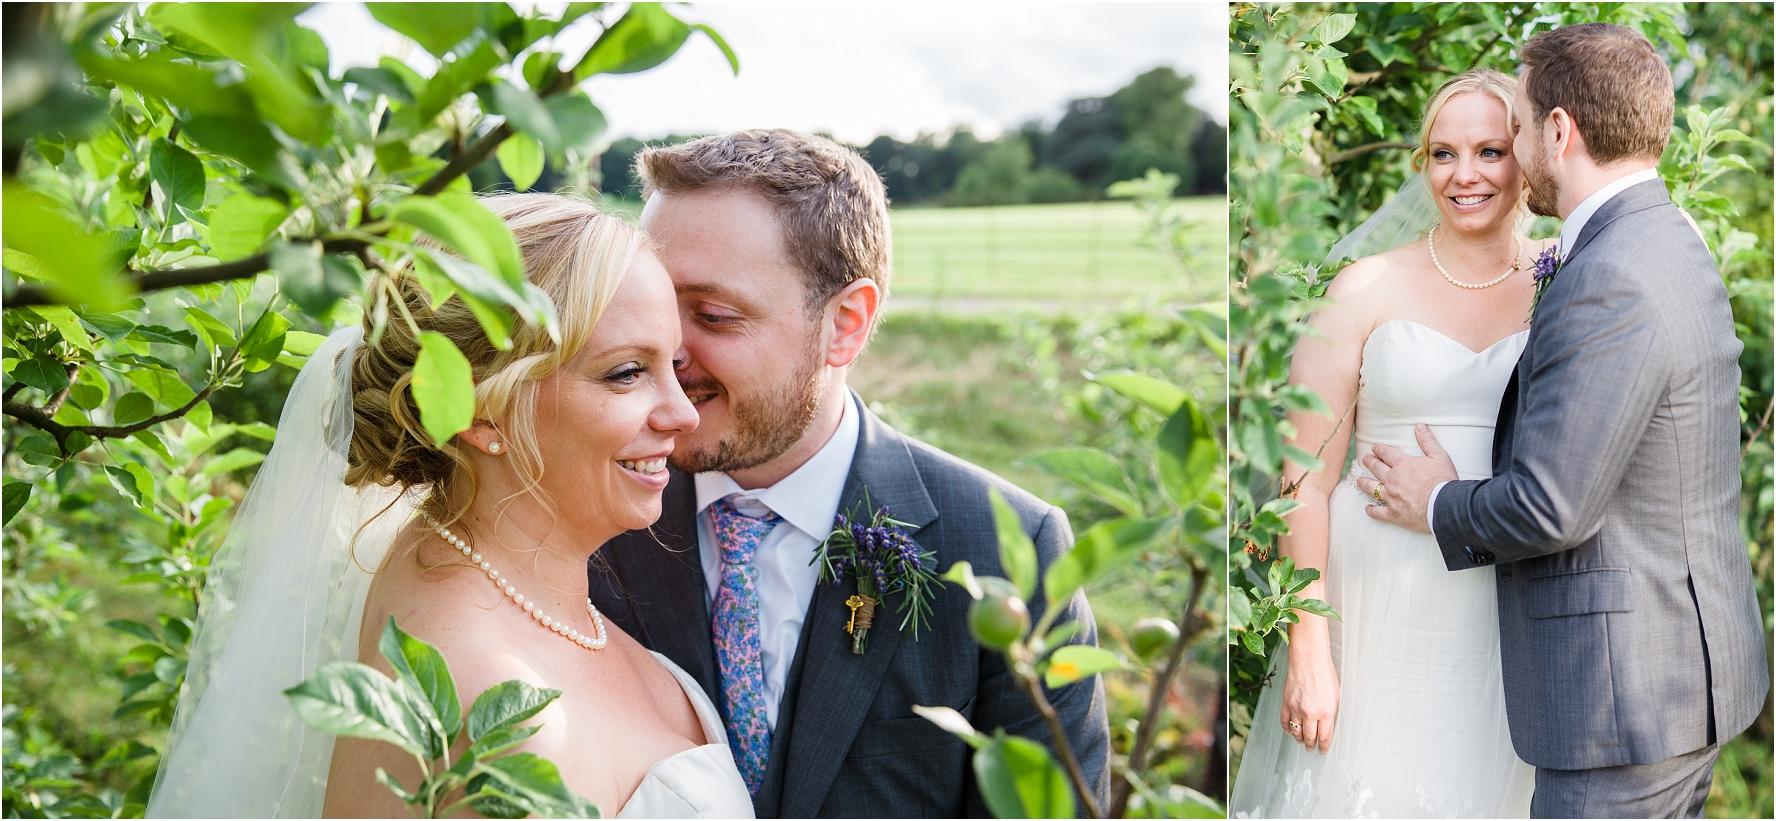 wedding-photography-the-orangery-settringham_0493